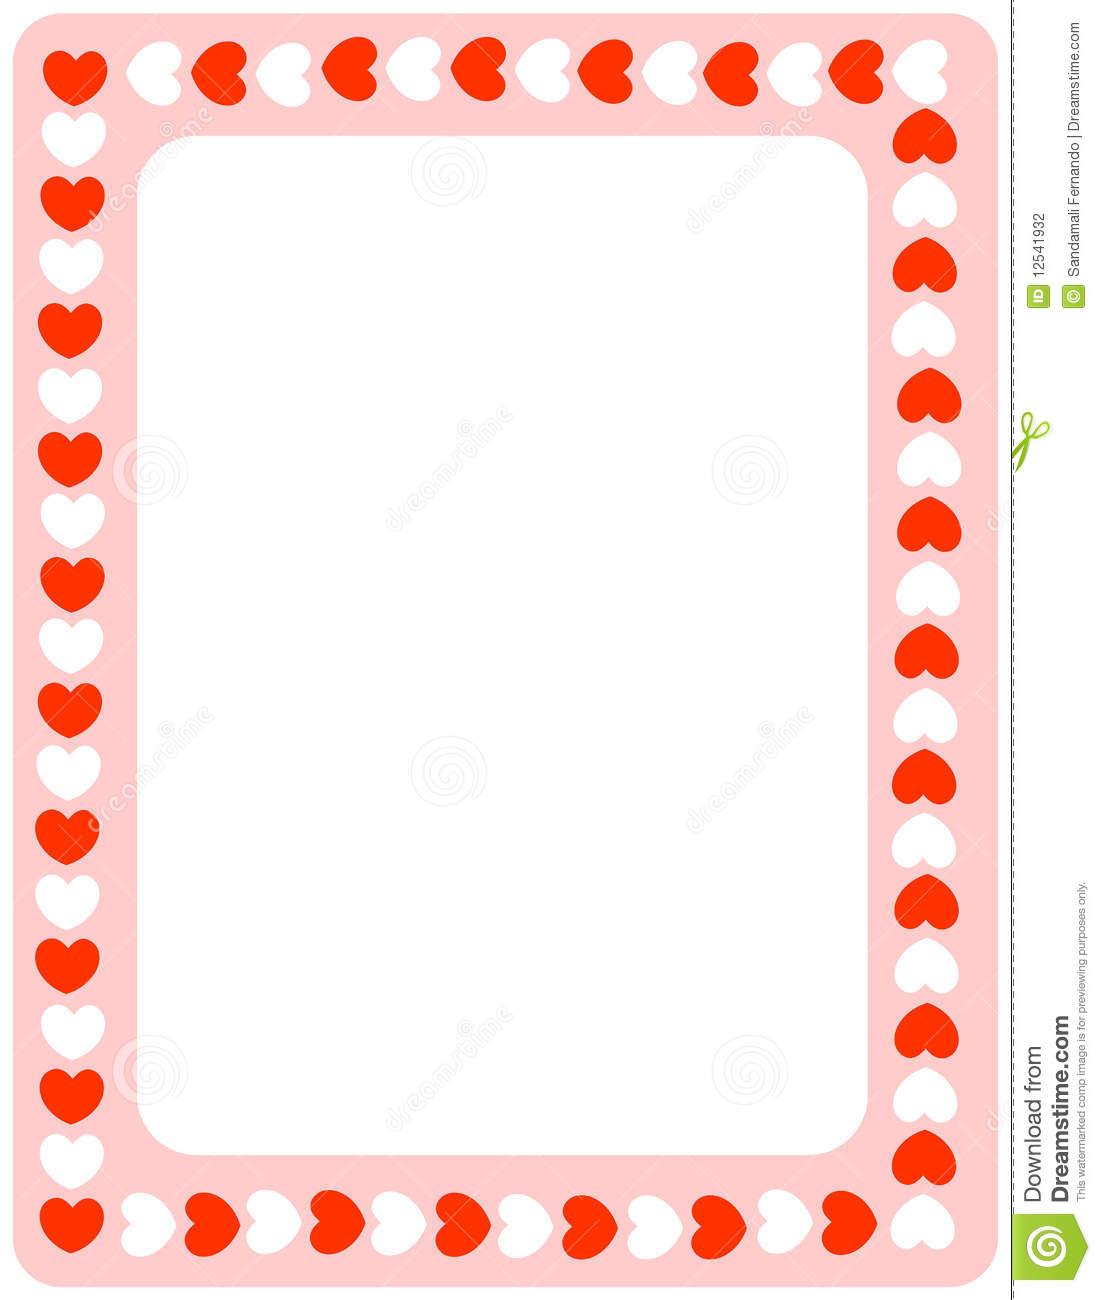 Clip Art Valentines Day Borders Clip Art valentine border clipart kid heart red hearts valentines day